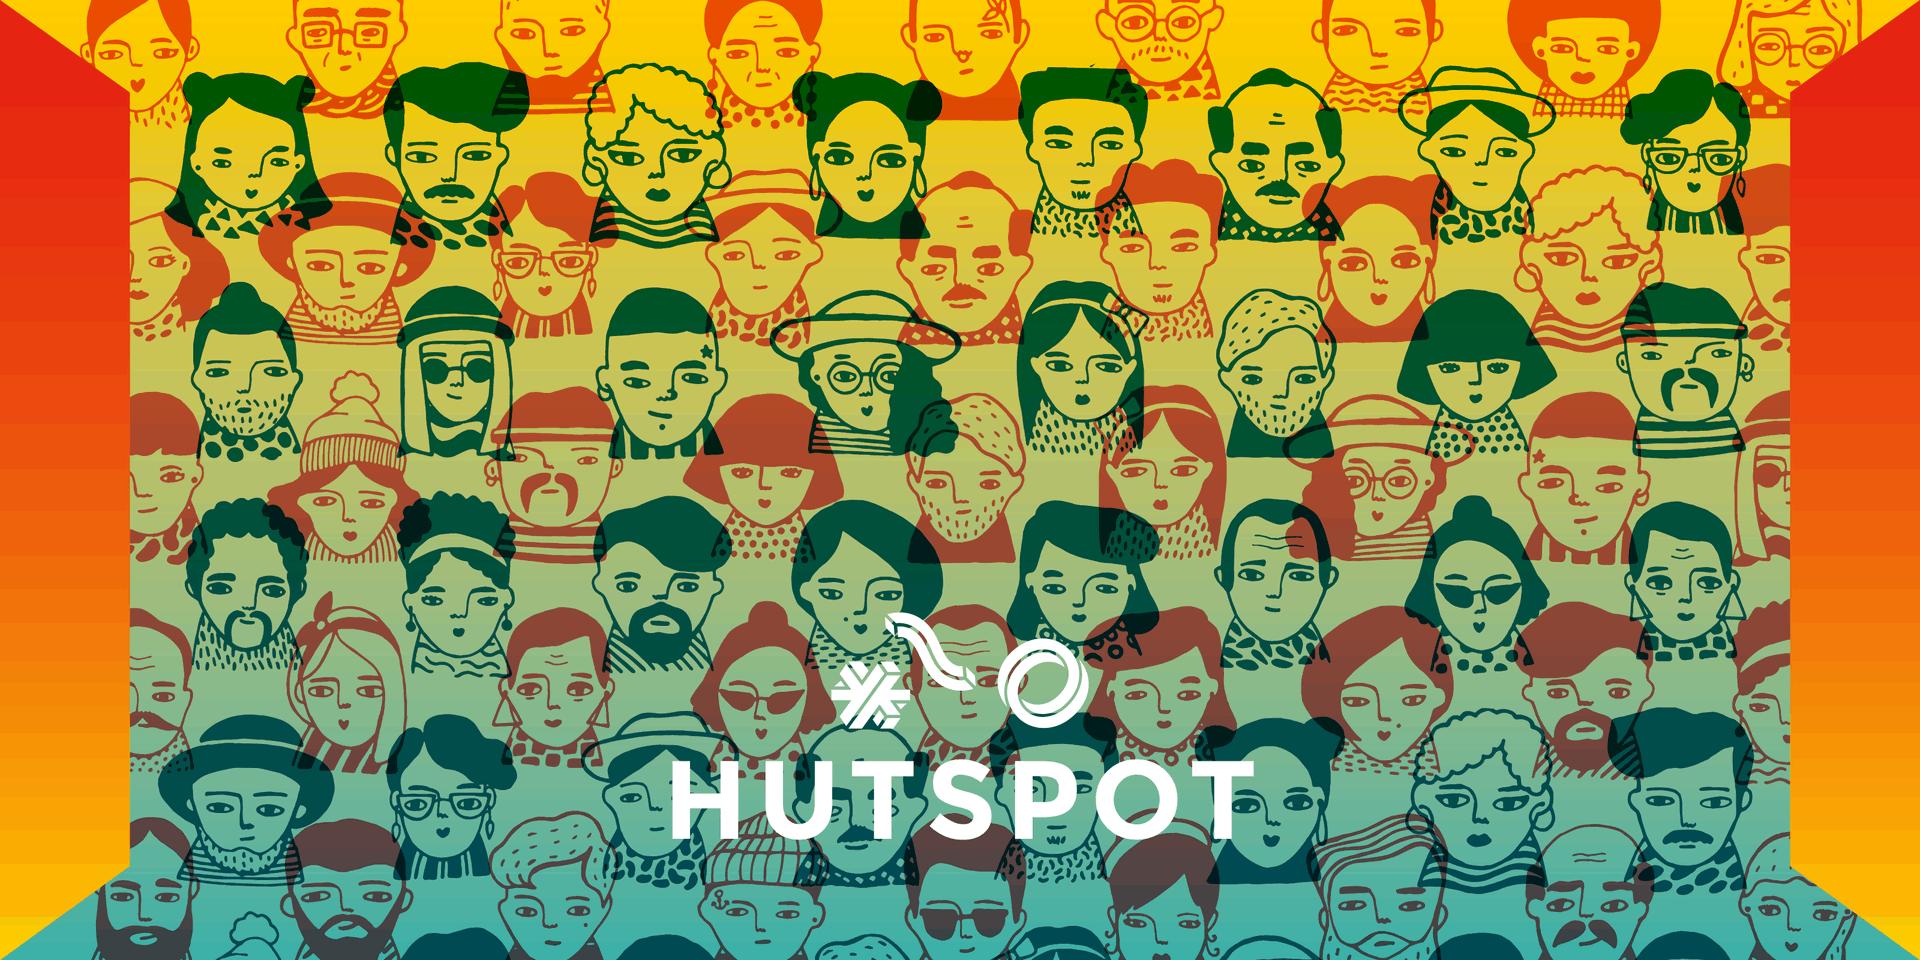 Hutspot: nostalgie in Noord-Brabant